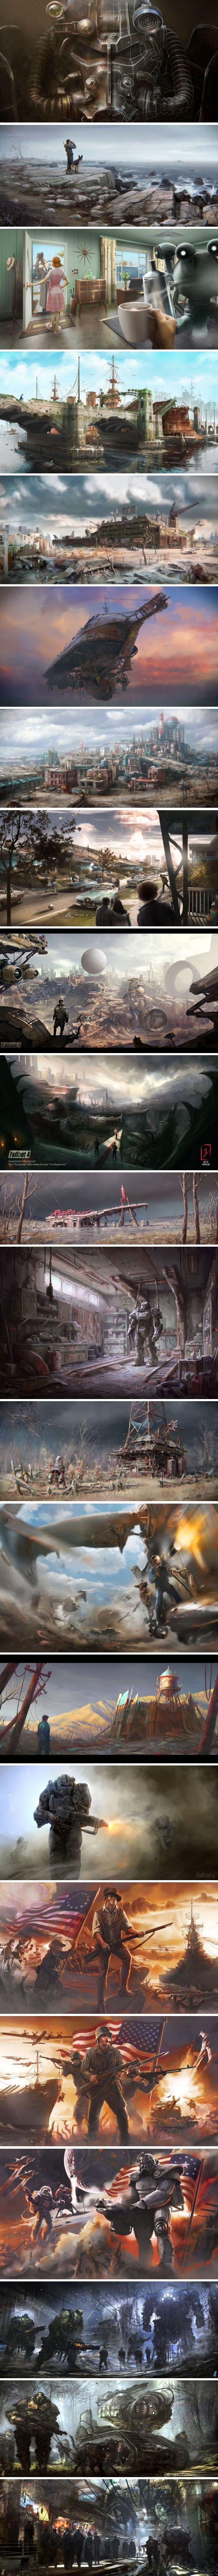 Подборка арта к Fallout 4 - Изображение 2